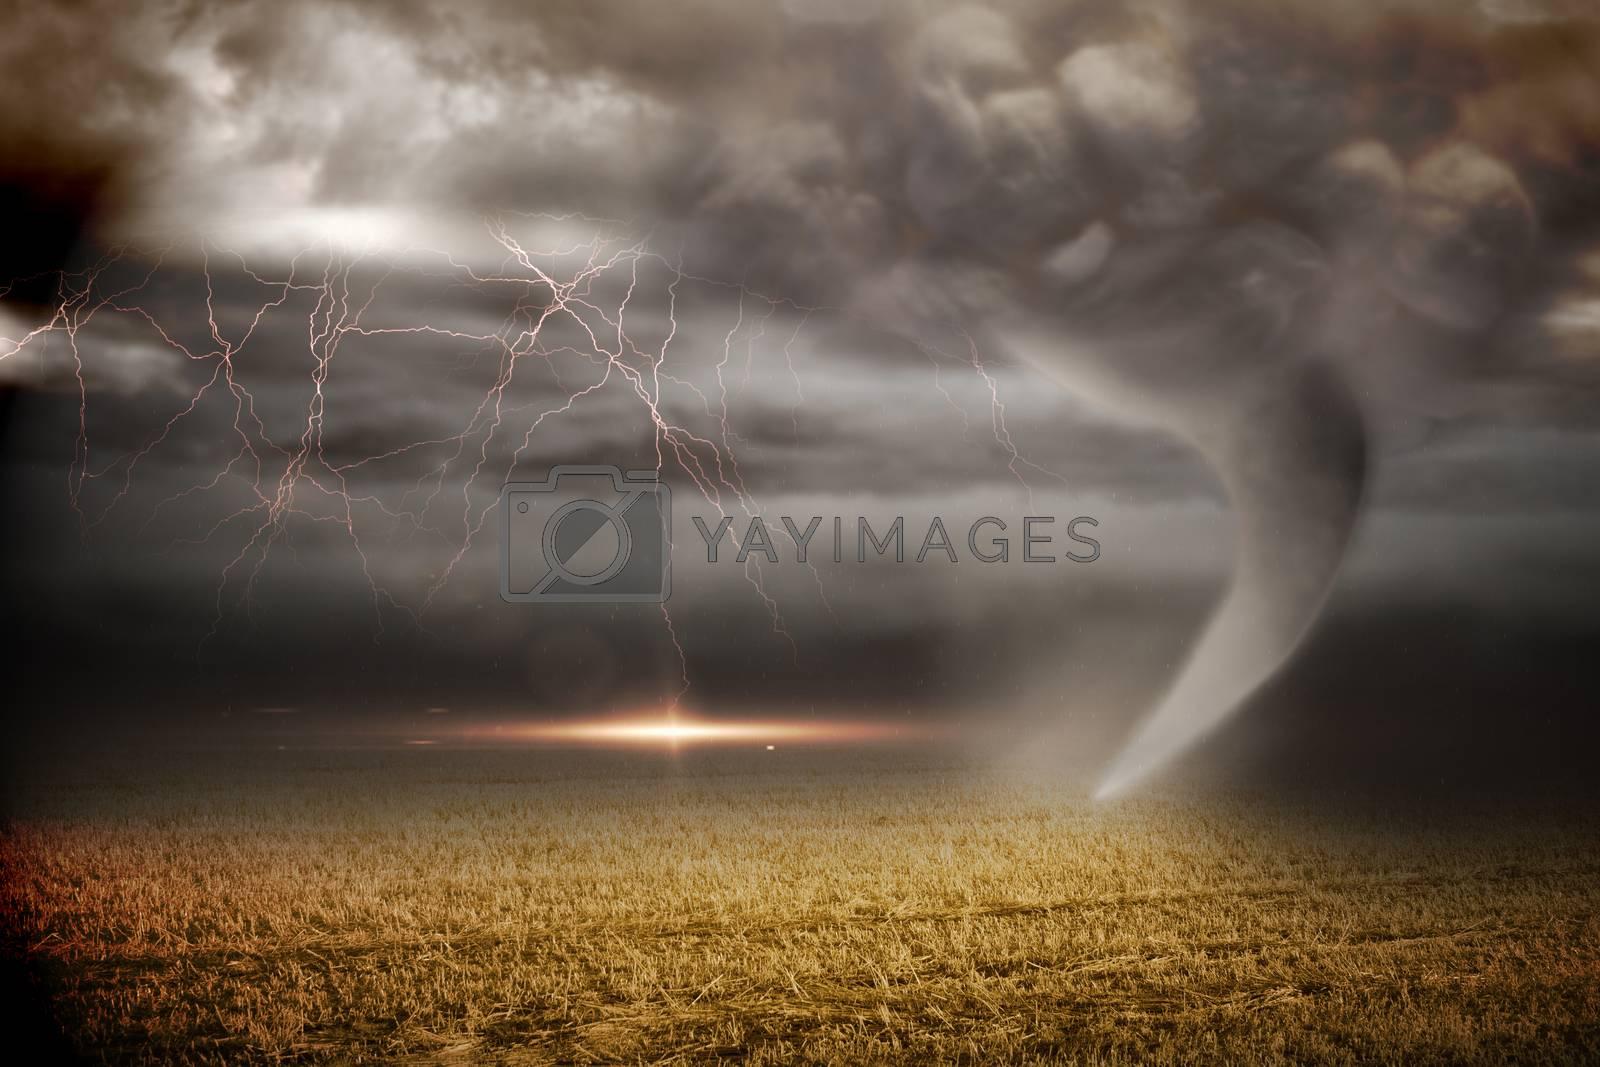 Royalty free image of Stormy sky with tornado over field by Wavebreakmedia